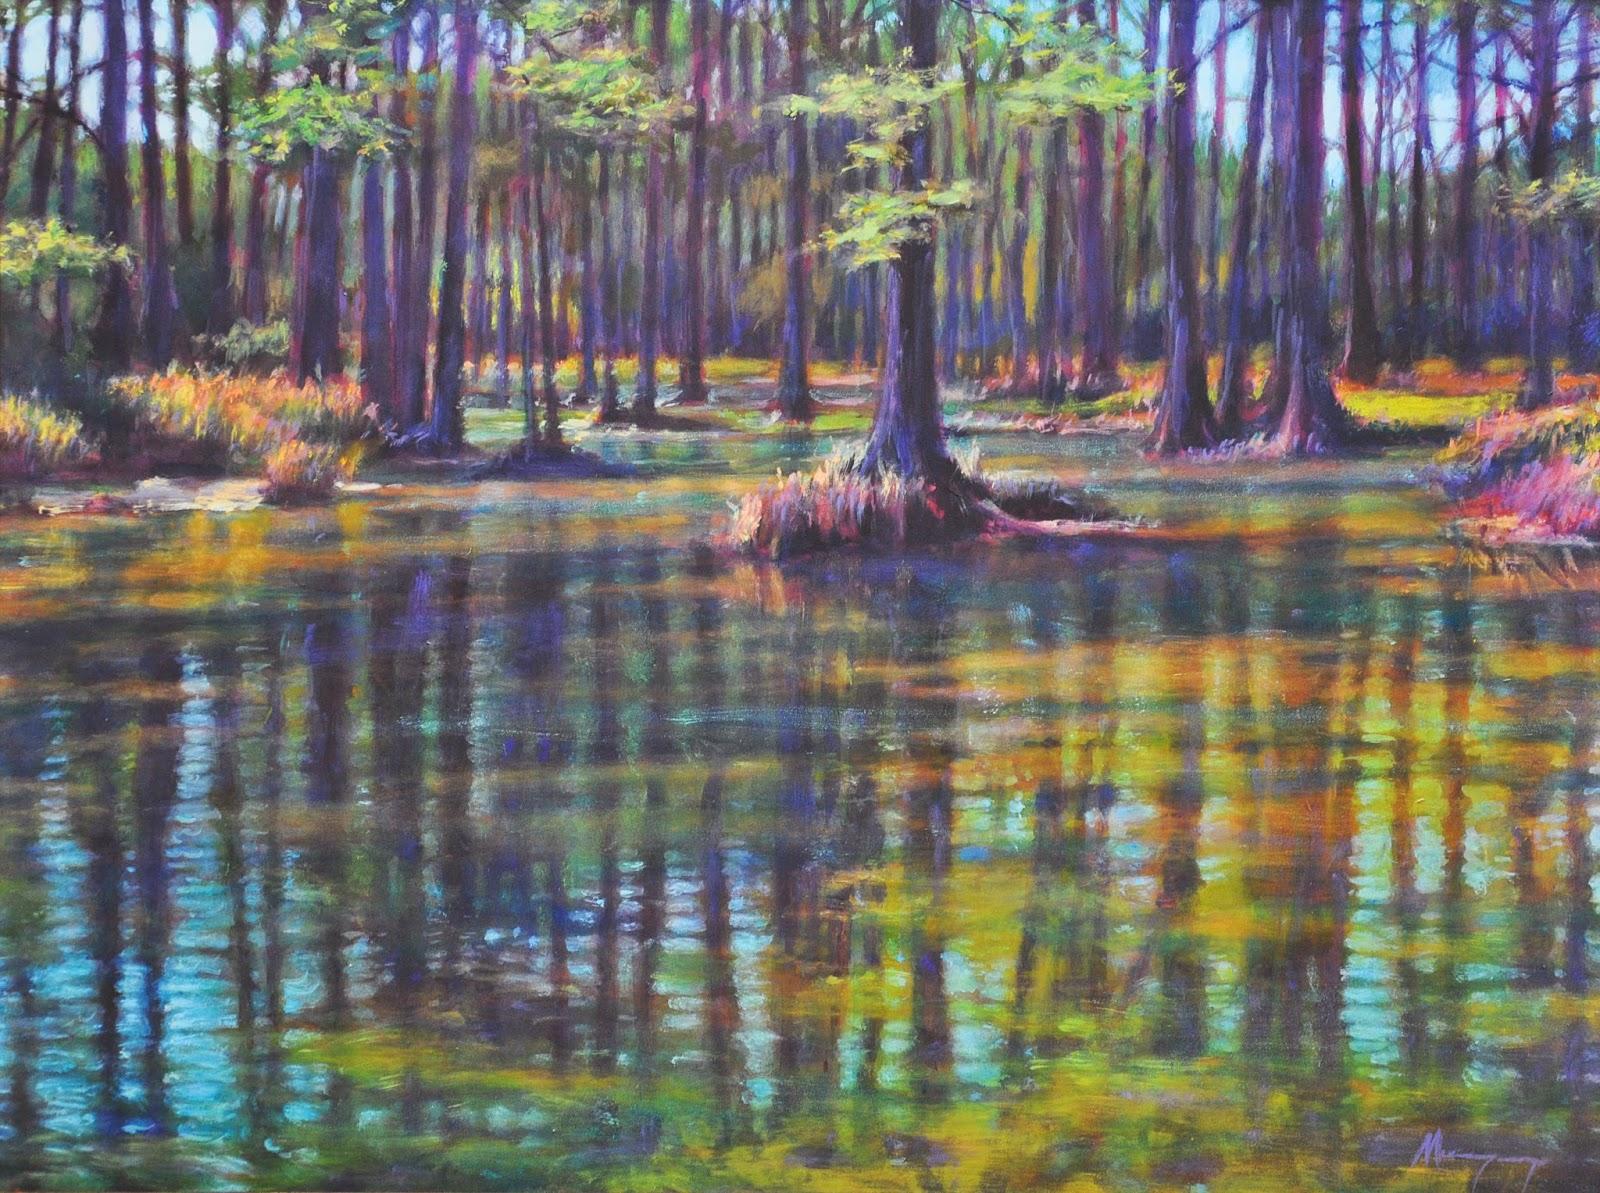 Cypress Shallows by Muenzenmayer